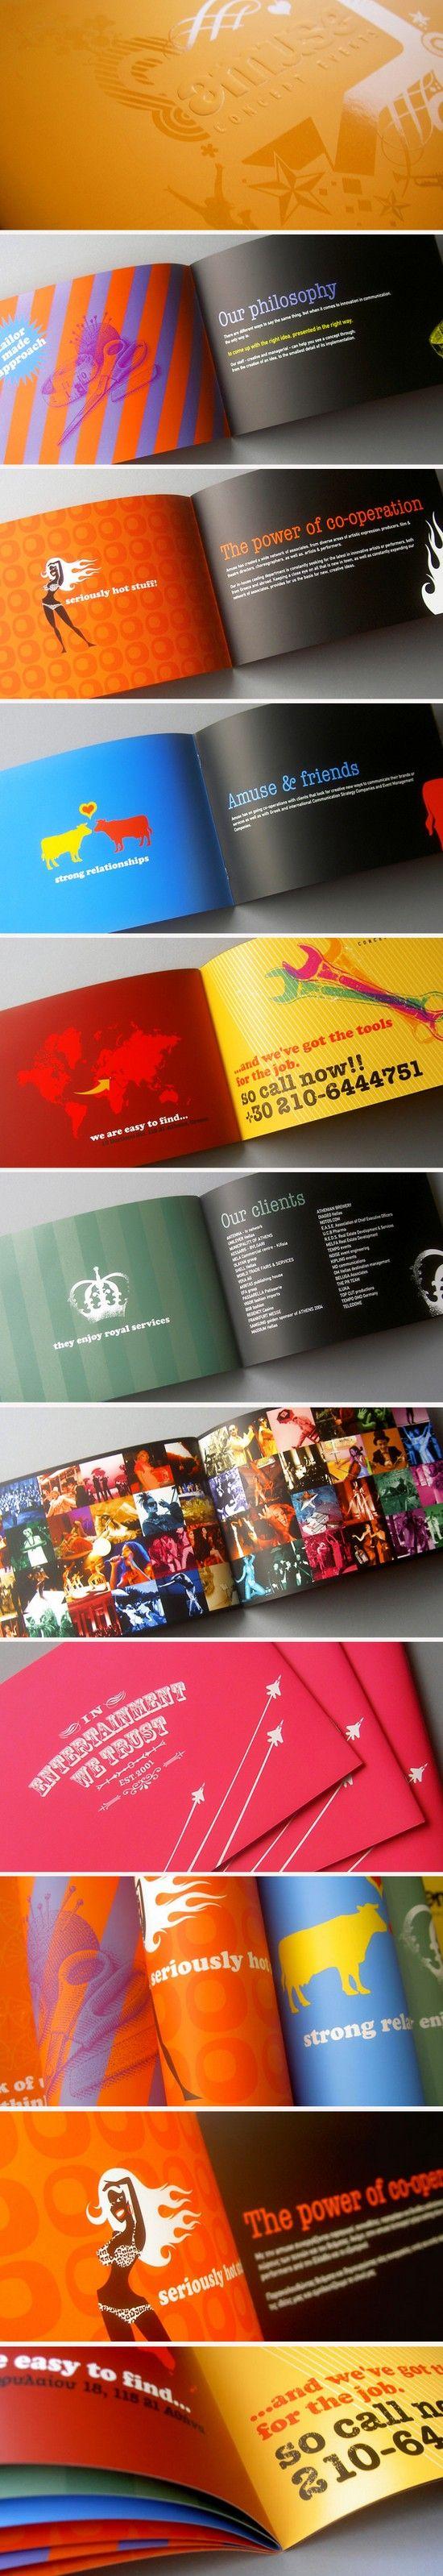 Cool Catalogue & Brochure Design | Bloggs74